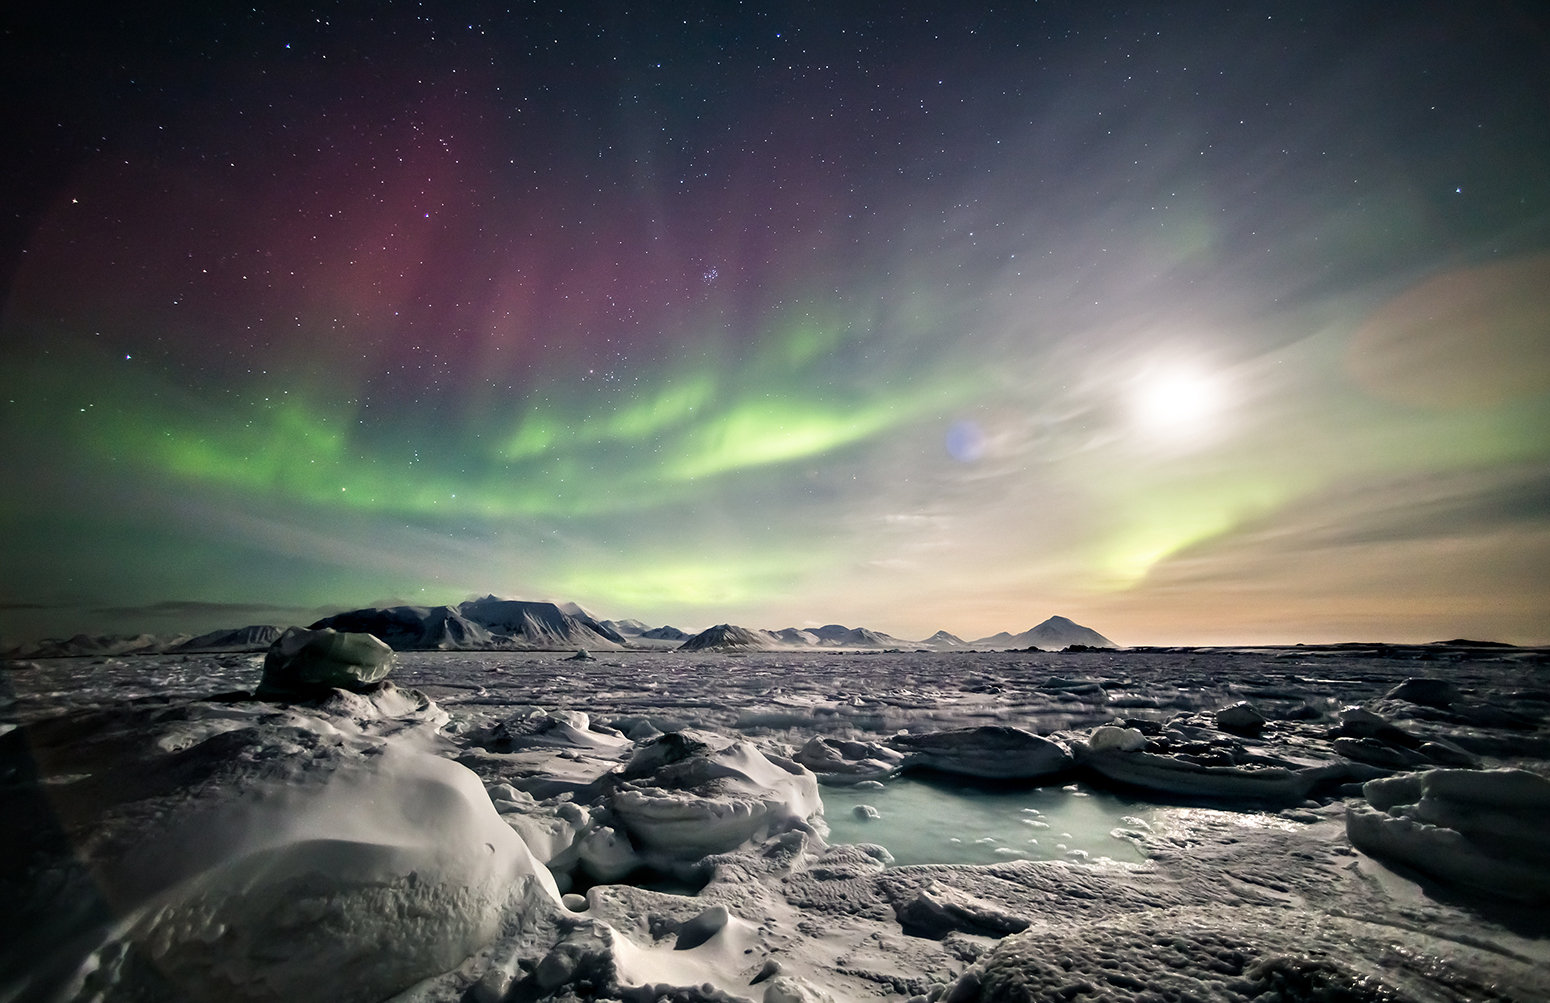 stock-arctic-landscape-northern-lights.jpg